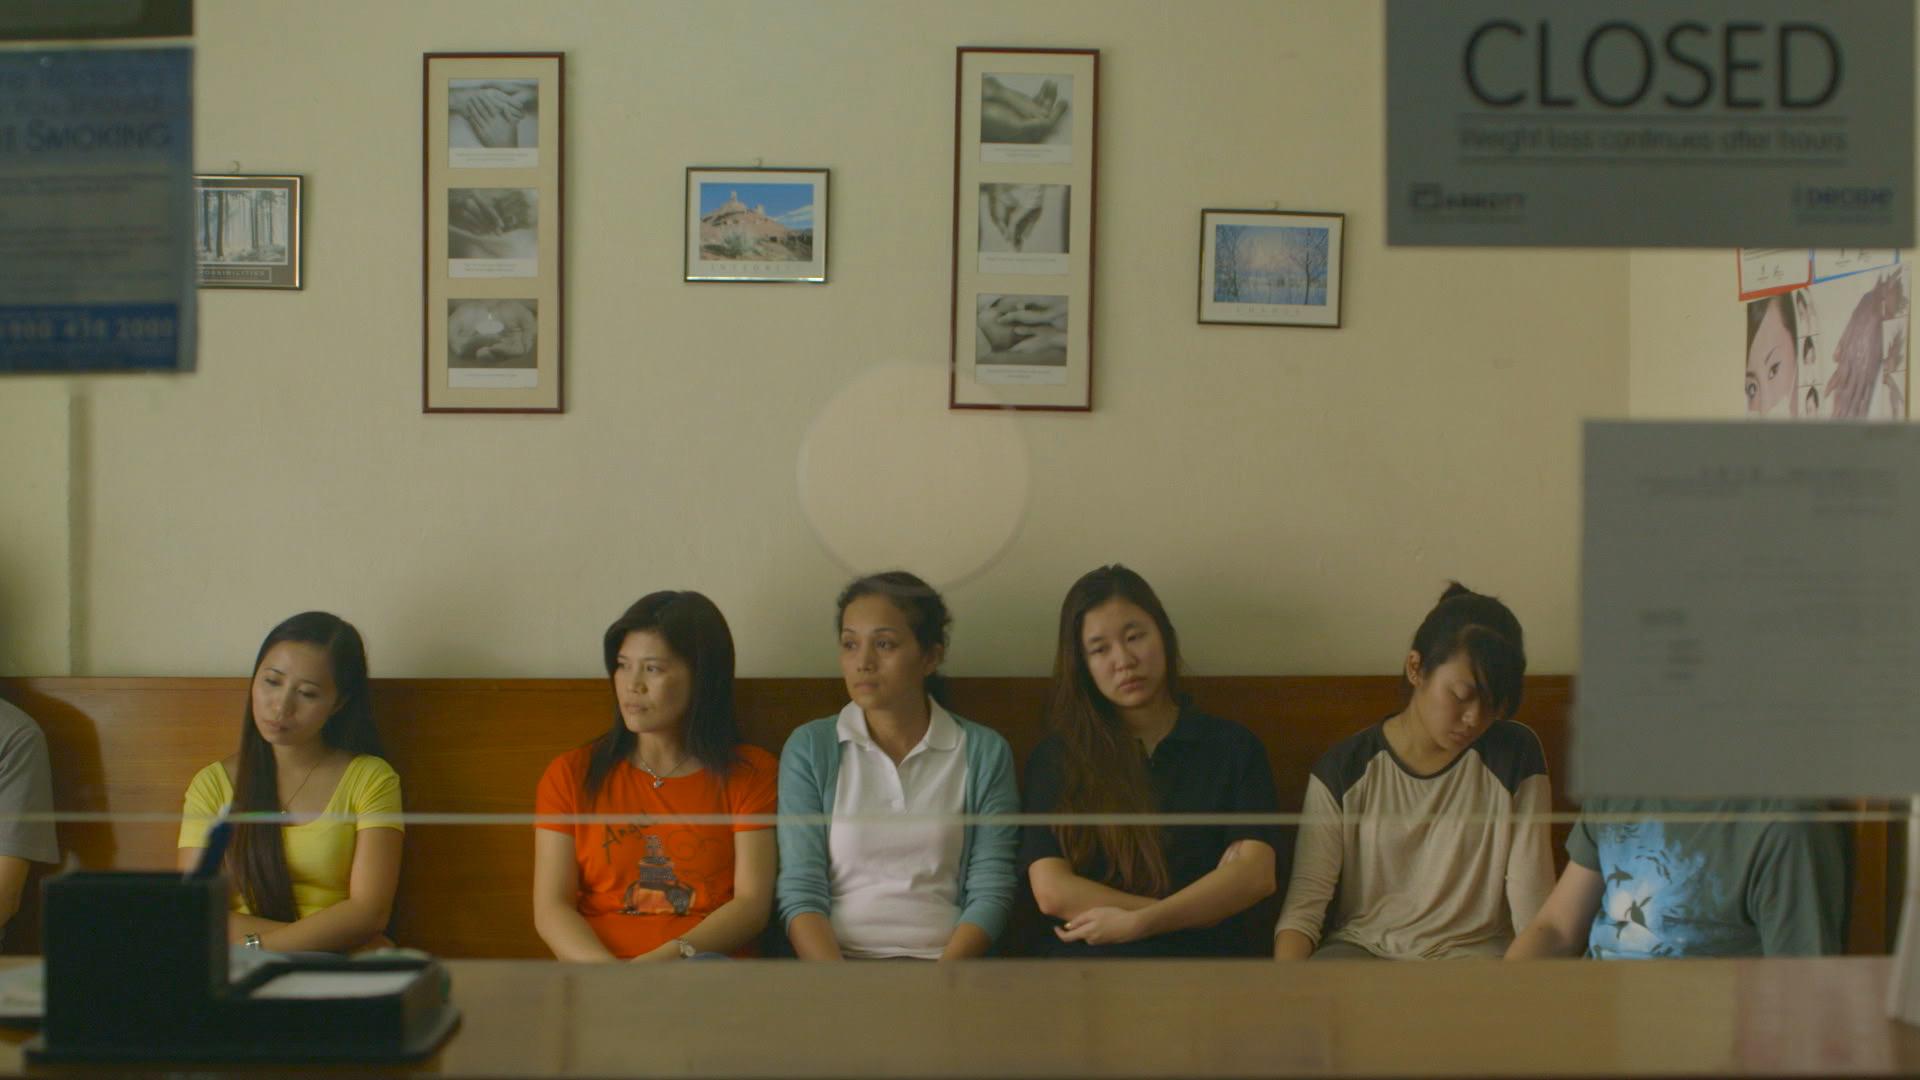 Remittance Still_Waiting Room_02